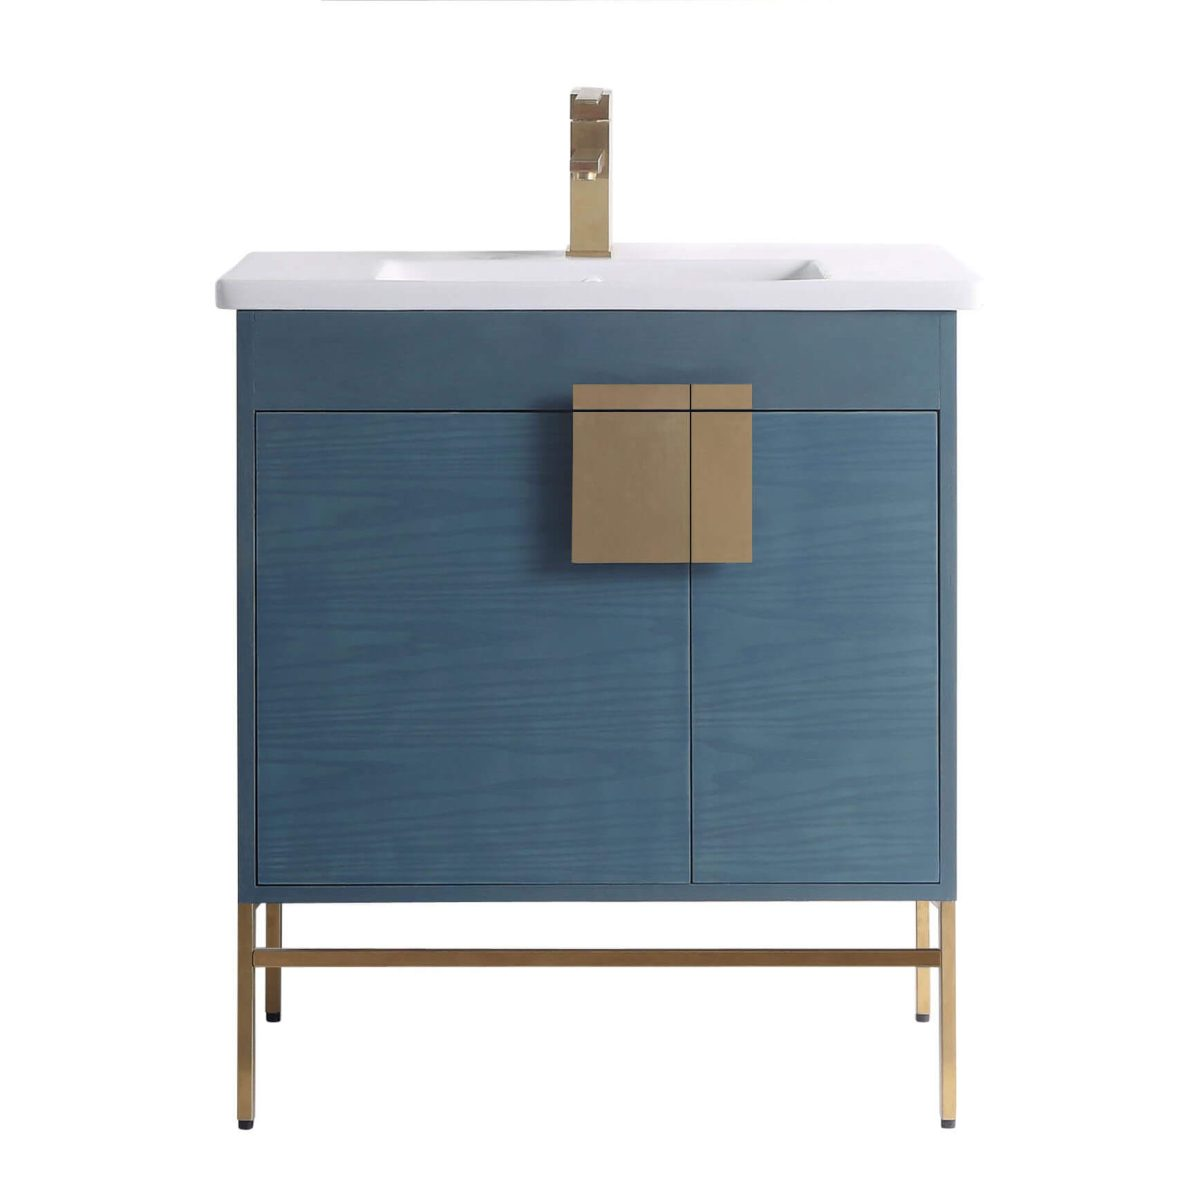 "Shawbridge 30"" Modern Bathroom Vanity  French Blue with Satin Brass Hardware"